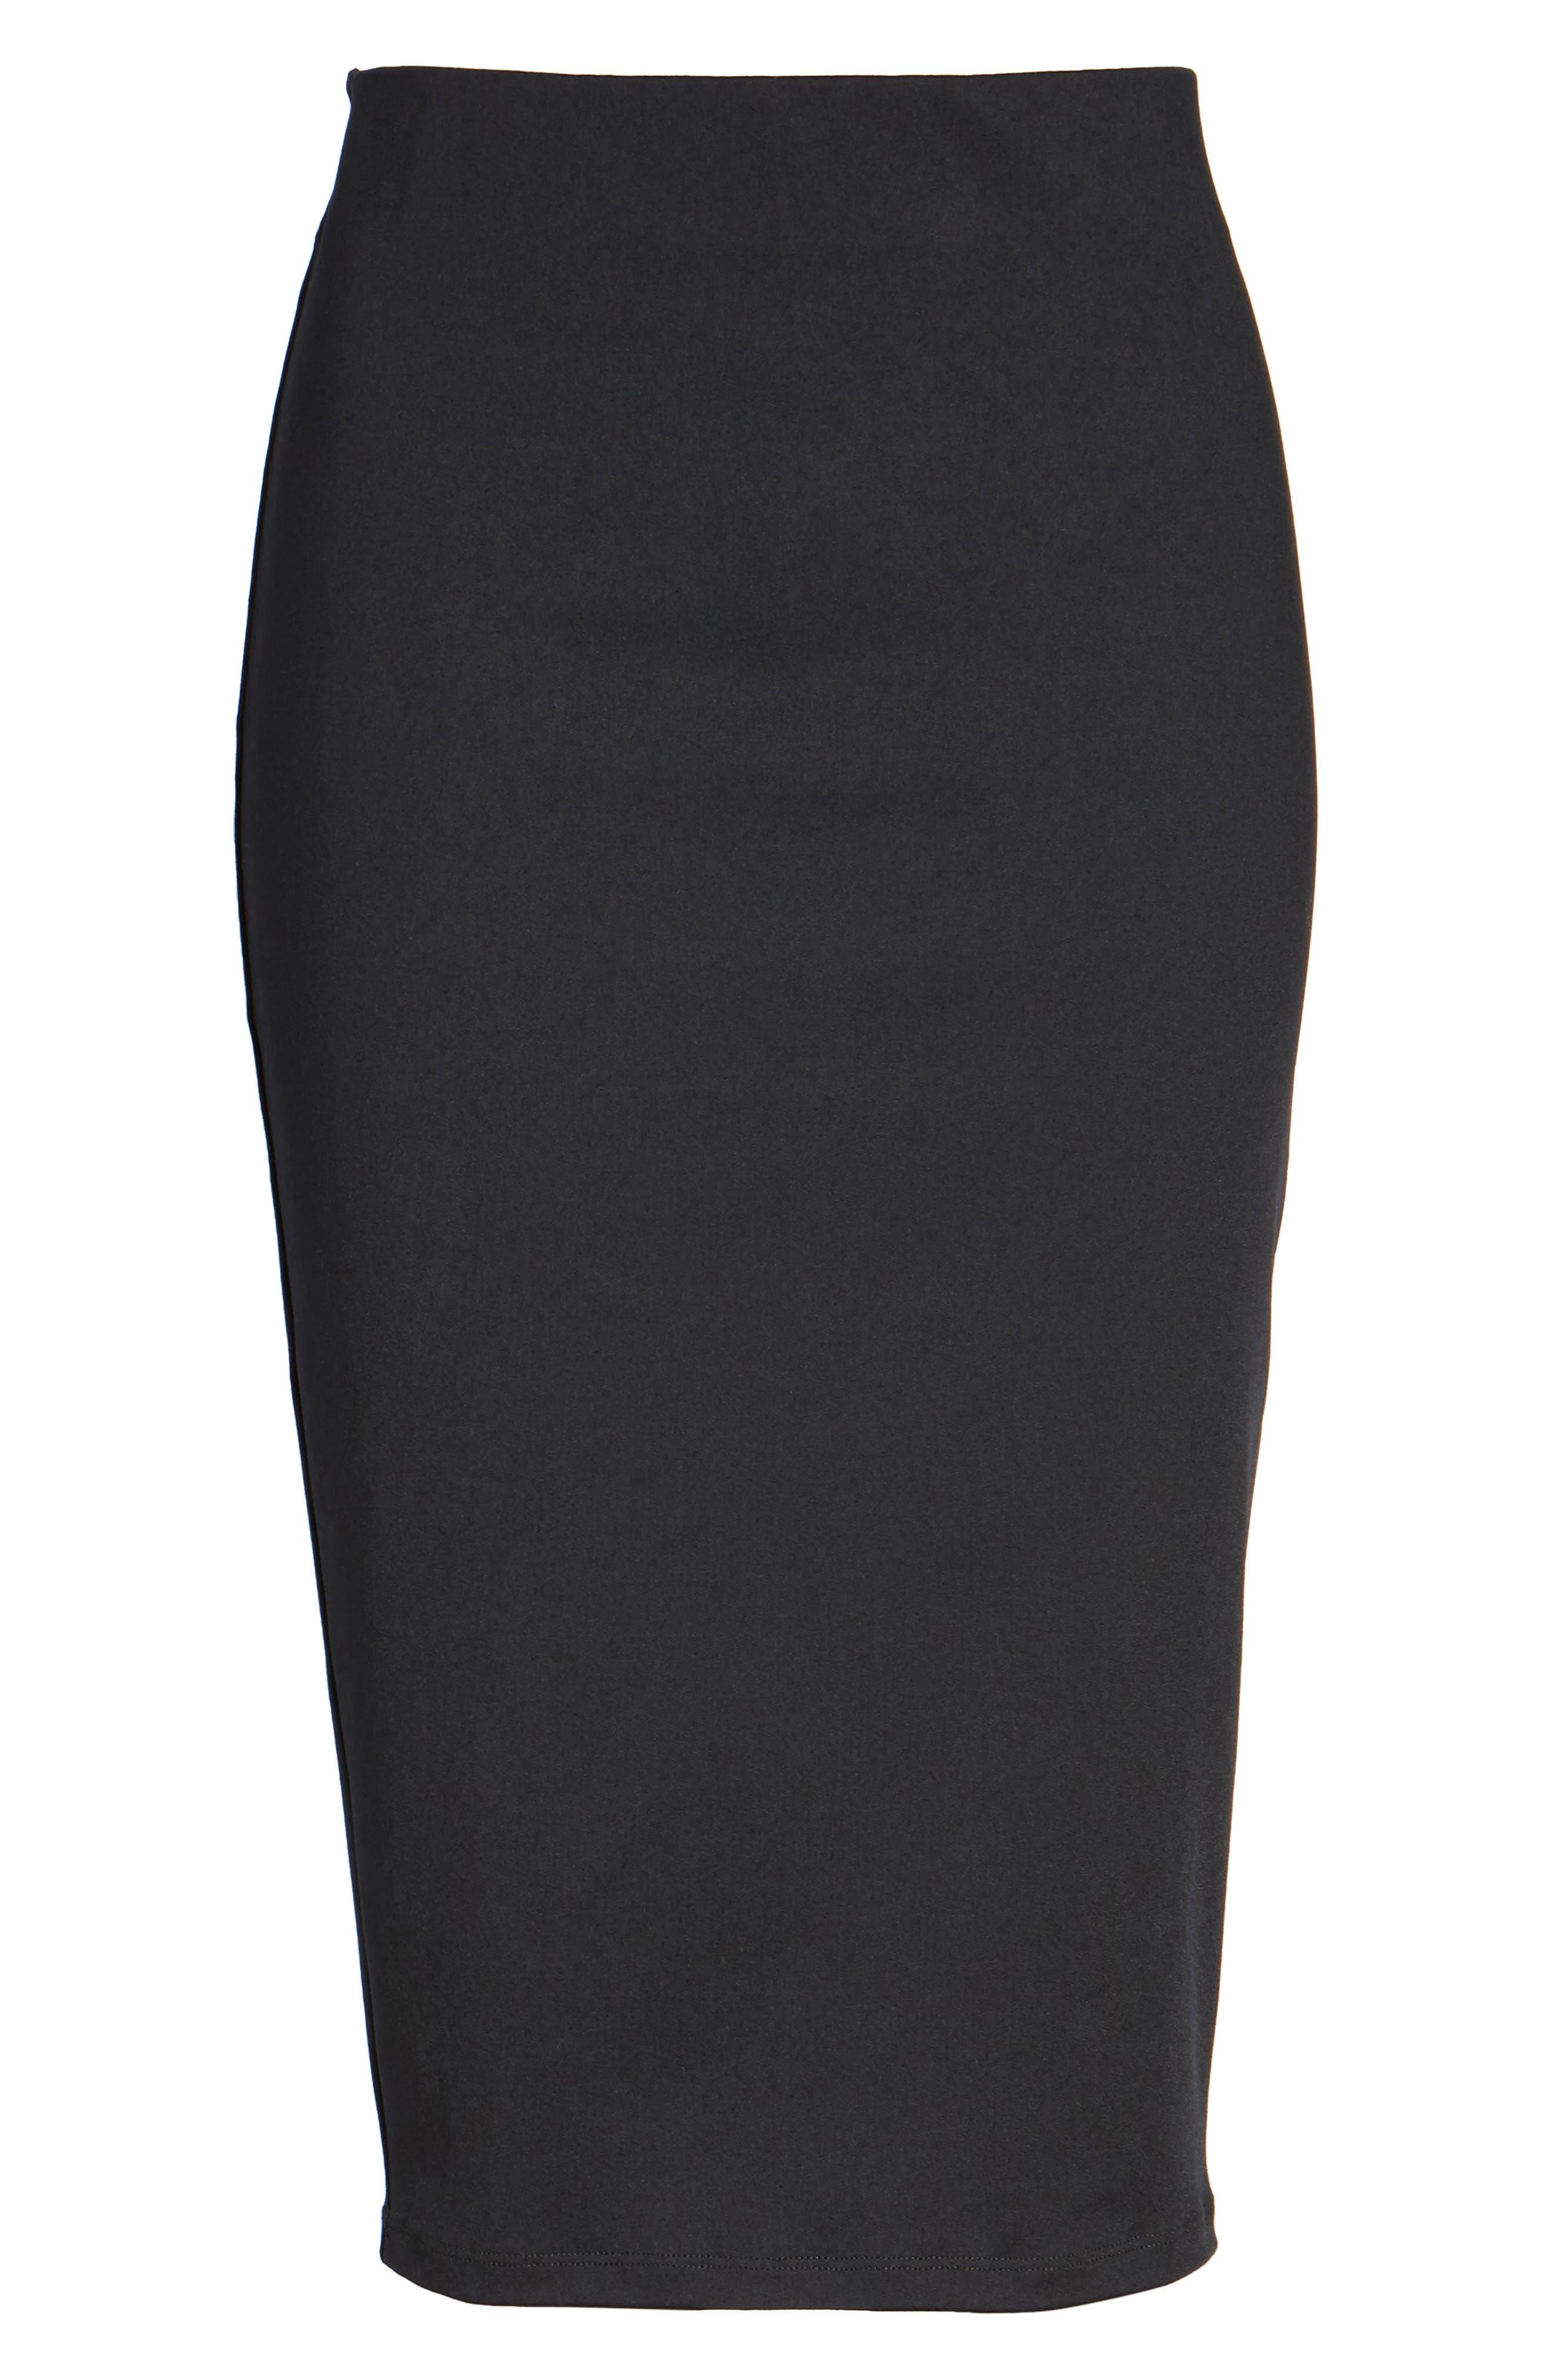 Alternate Image 4  - David Lerner Tube High Rise Pencil Skirt